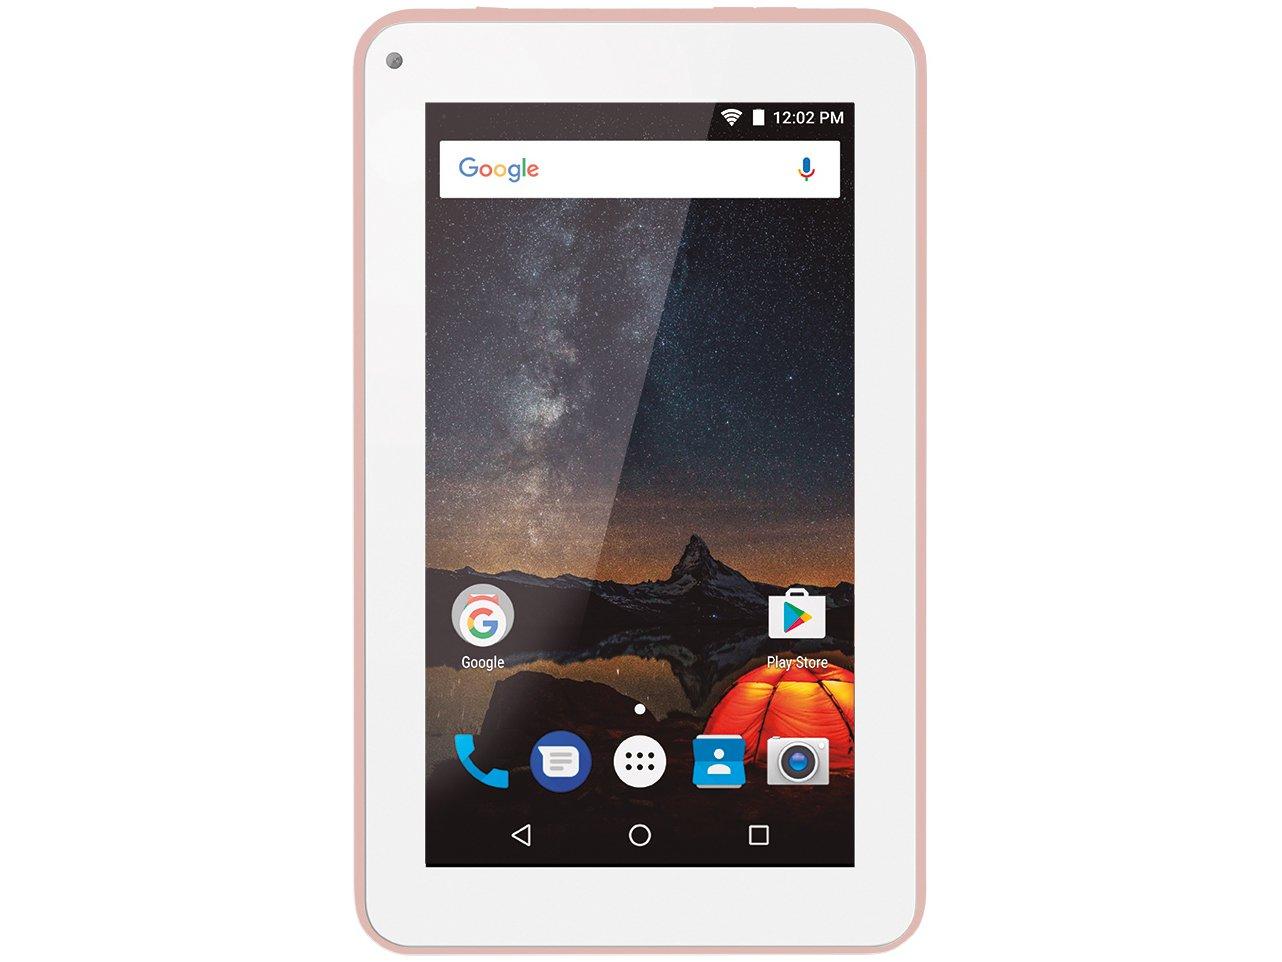 Foto 4 - Tablet Multilaser M7S Plus 8GB 7 Wi-Fi - Android 7.0 Proc. Quad Core Câmera Integrada